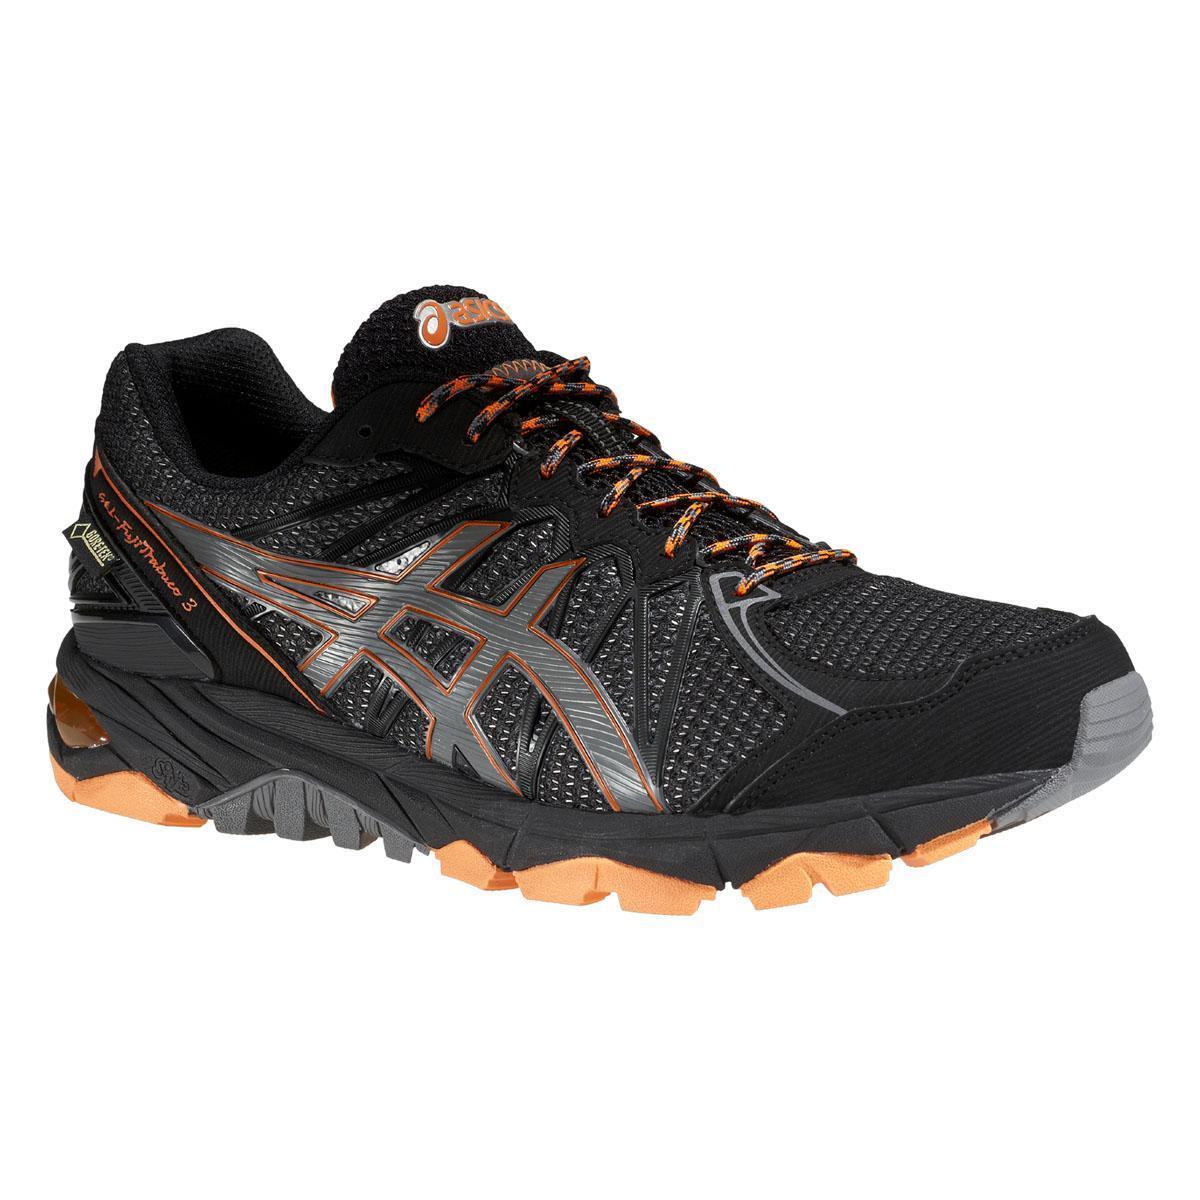 Mens Gel Tx 3 Shoes Trail G Running Fuji Trabuco Asics Blackorange IeD29HYWE